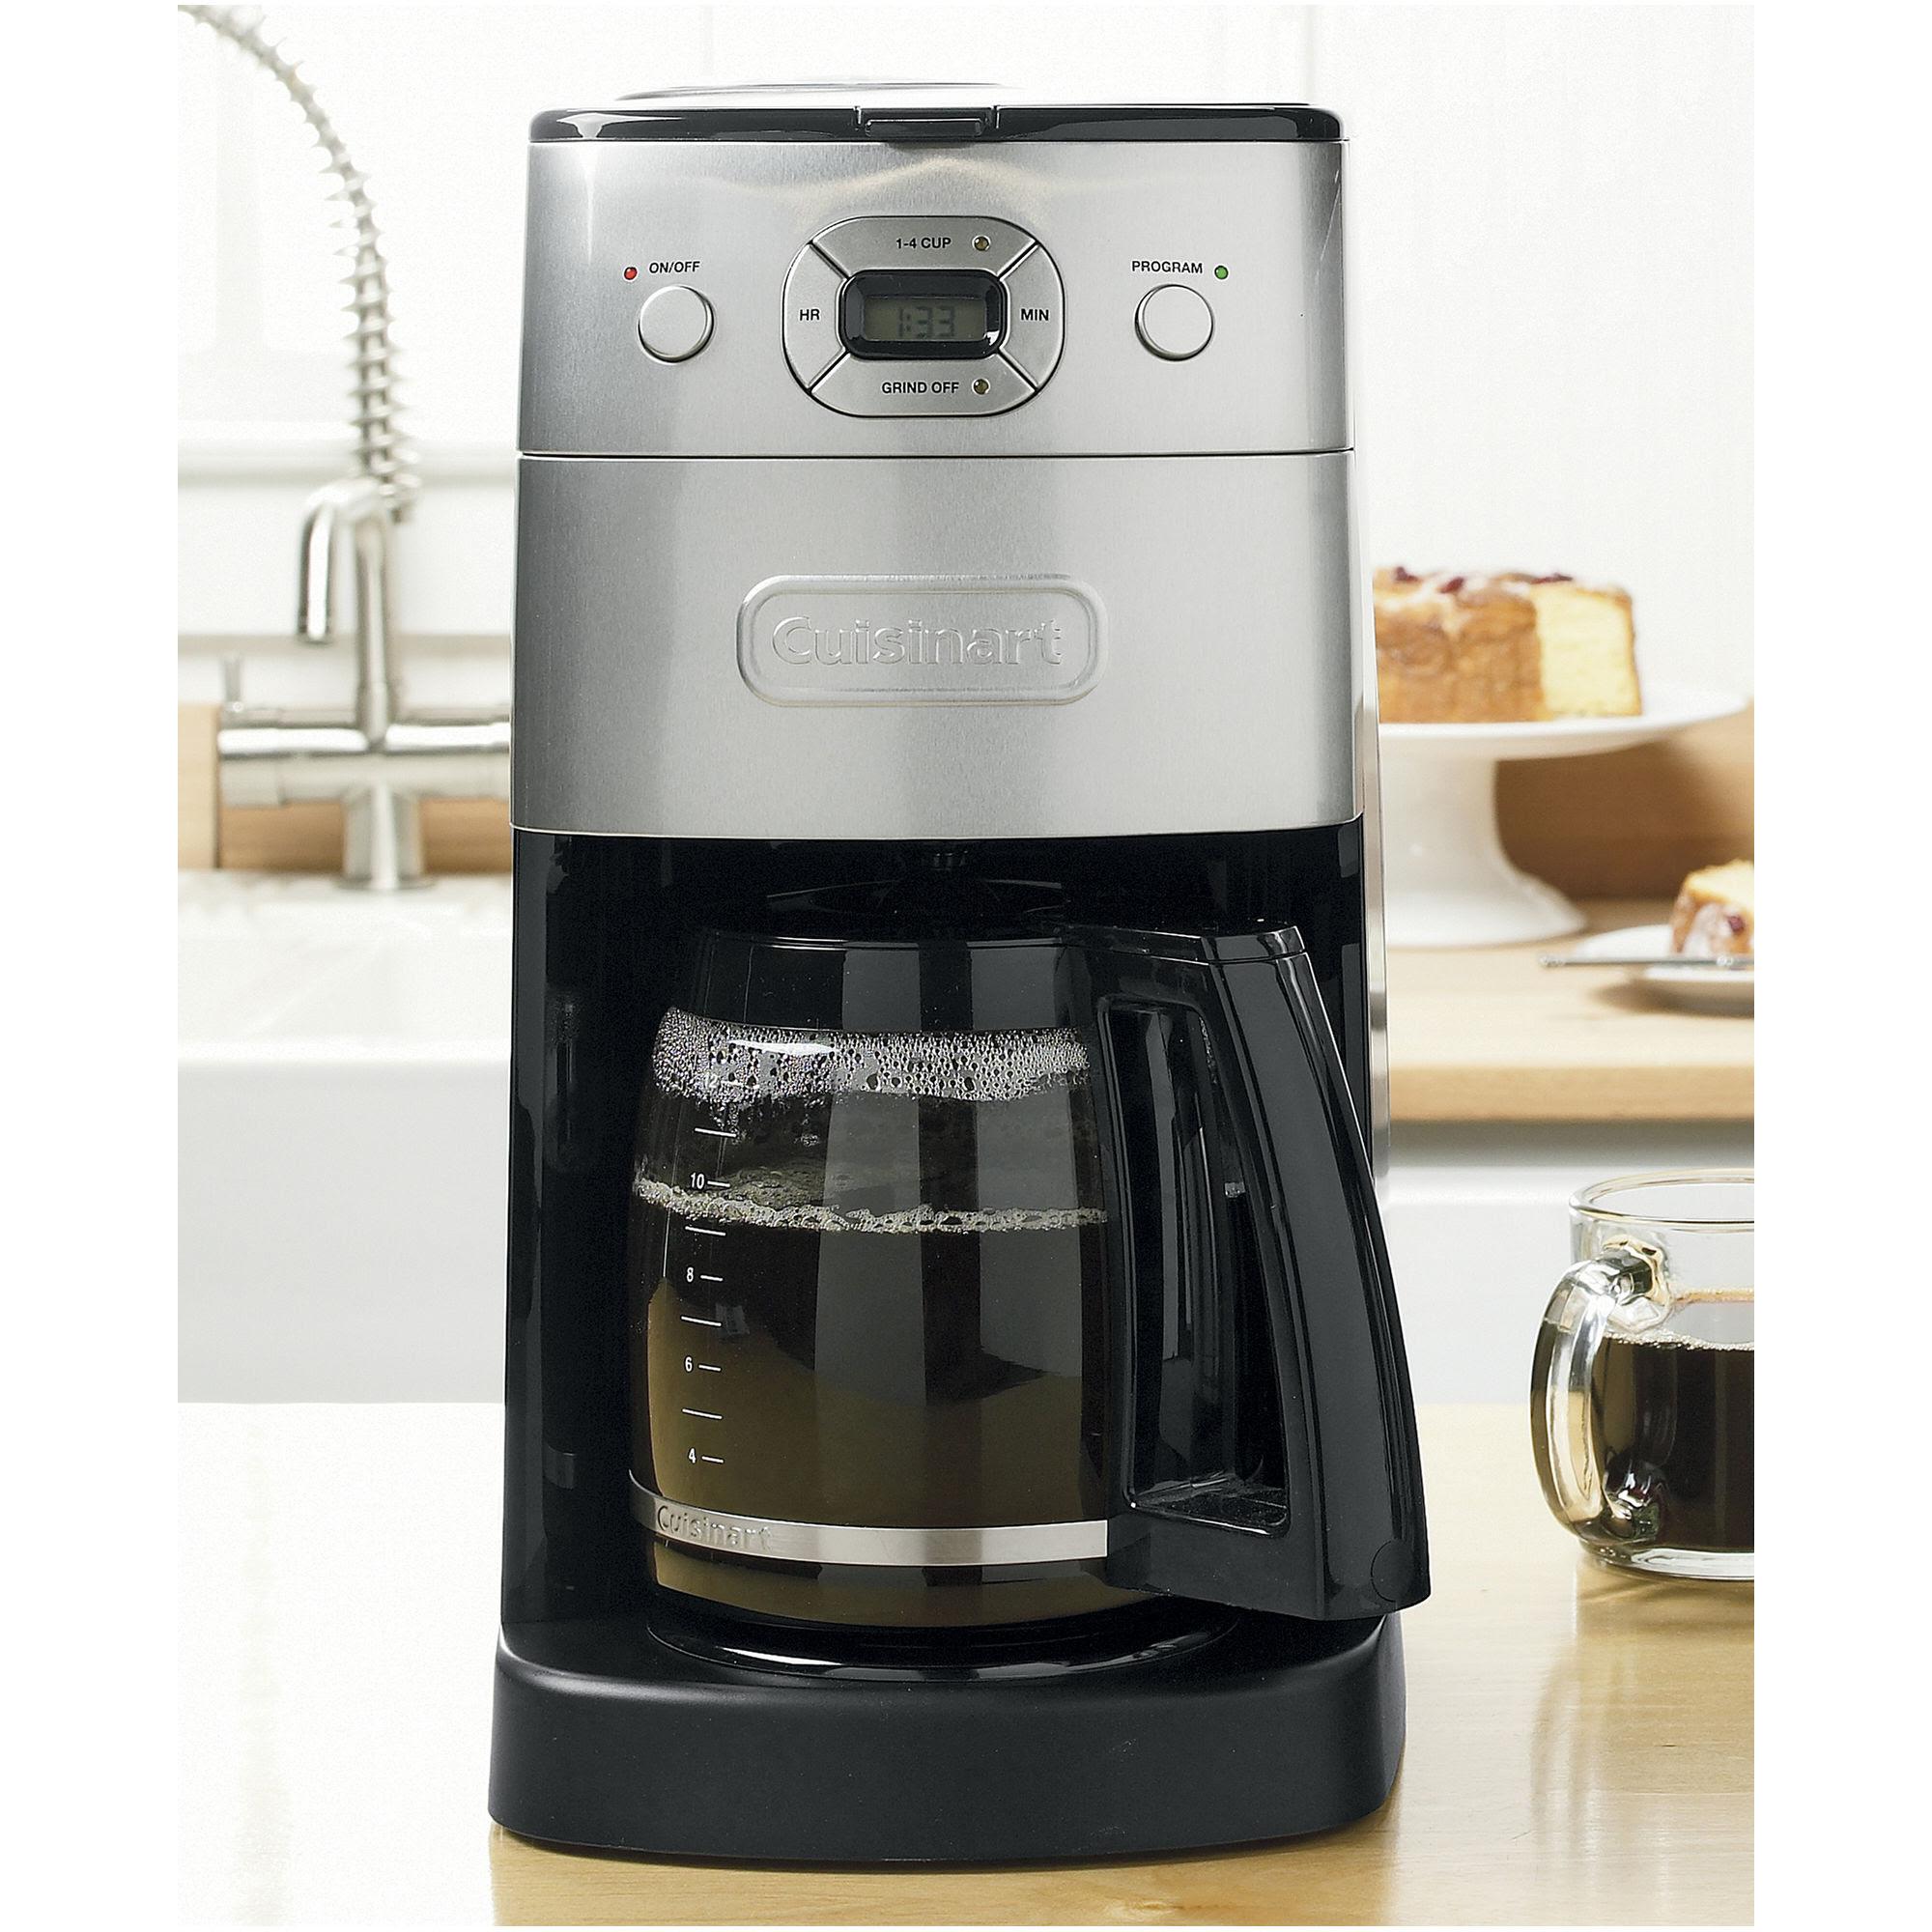 Cuisinart Coffee Maker Amps : BUY Cuisinart Grind & Brew